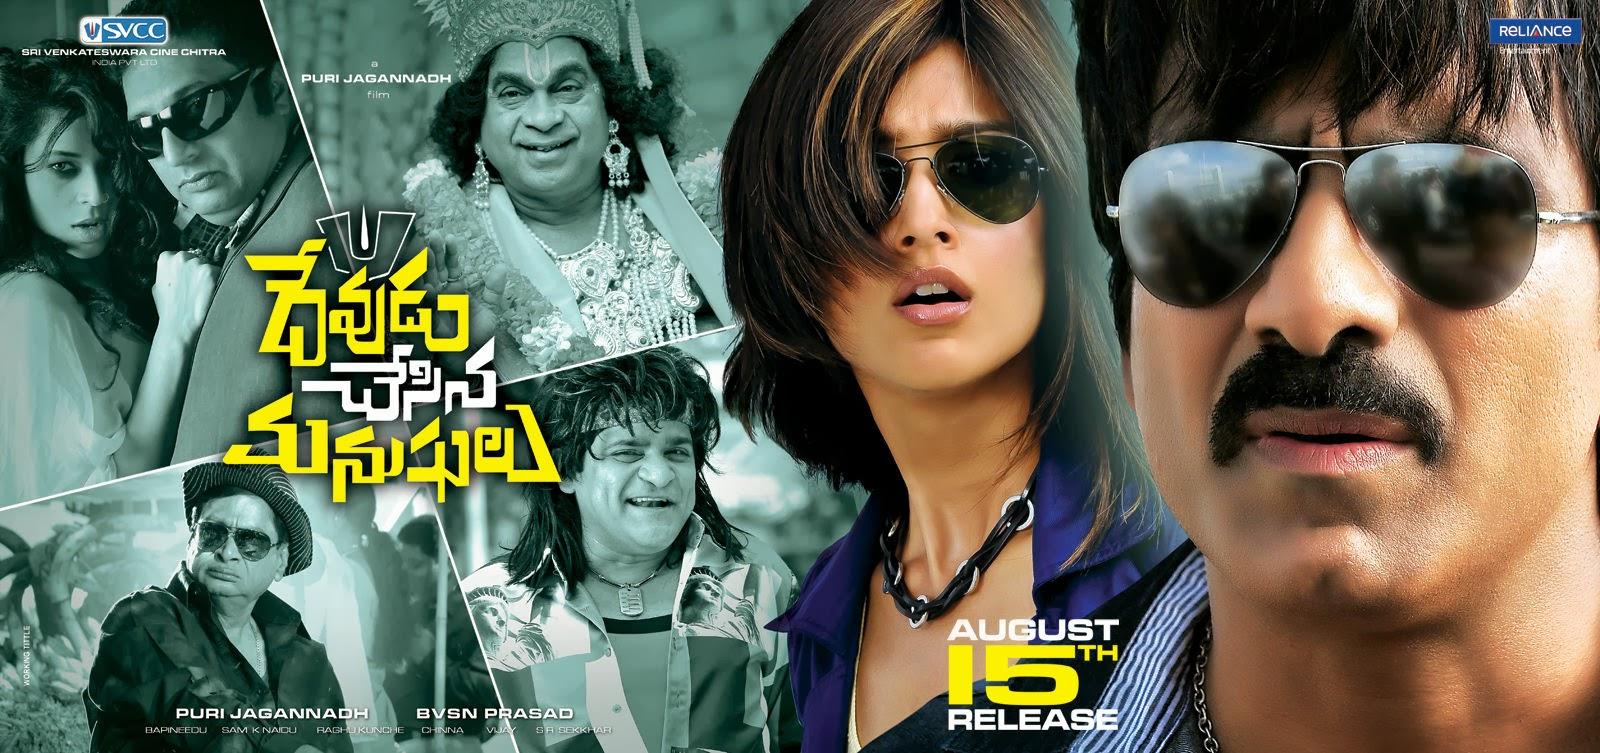 Hindi Bluray Full Movies Kaze No Stigma Episode Guide Season 2